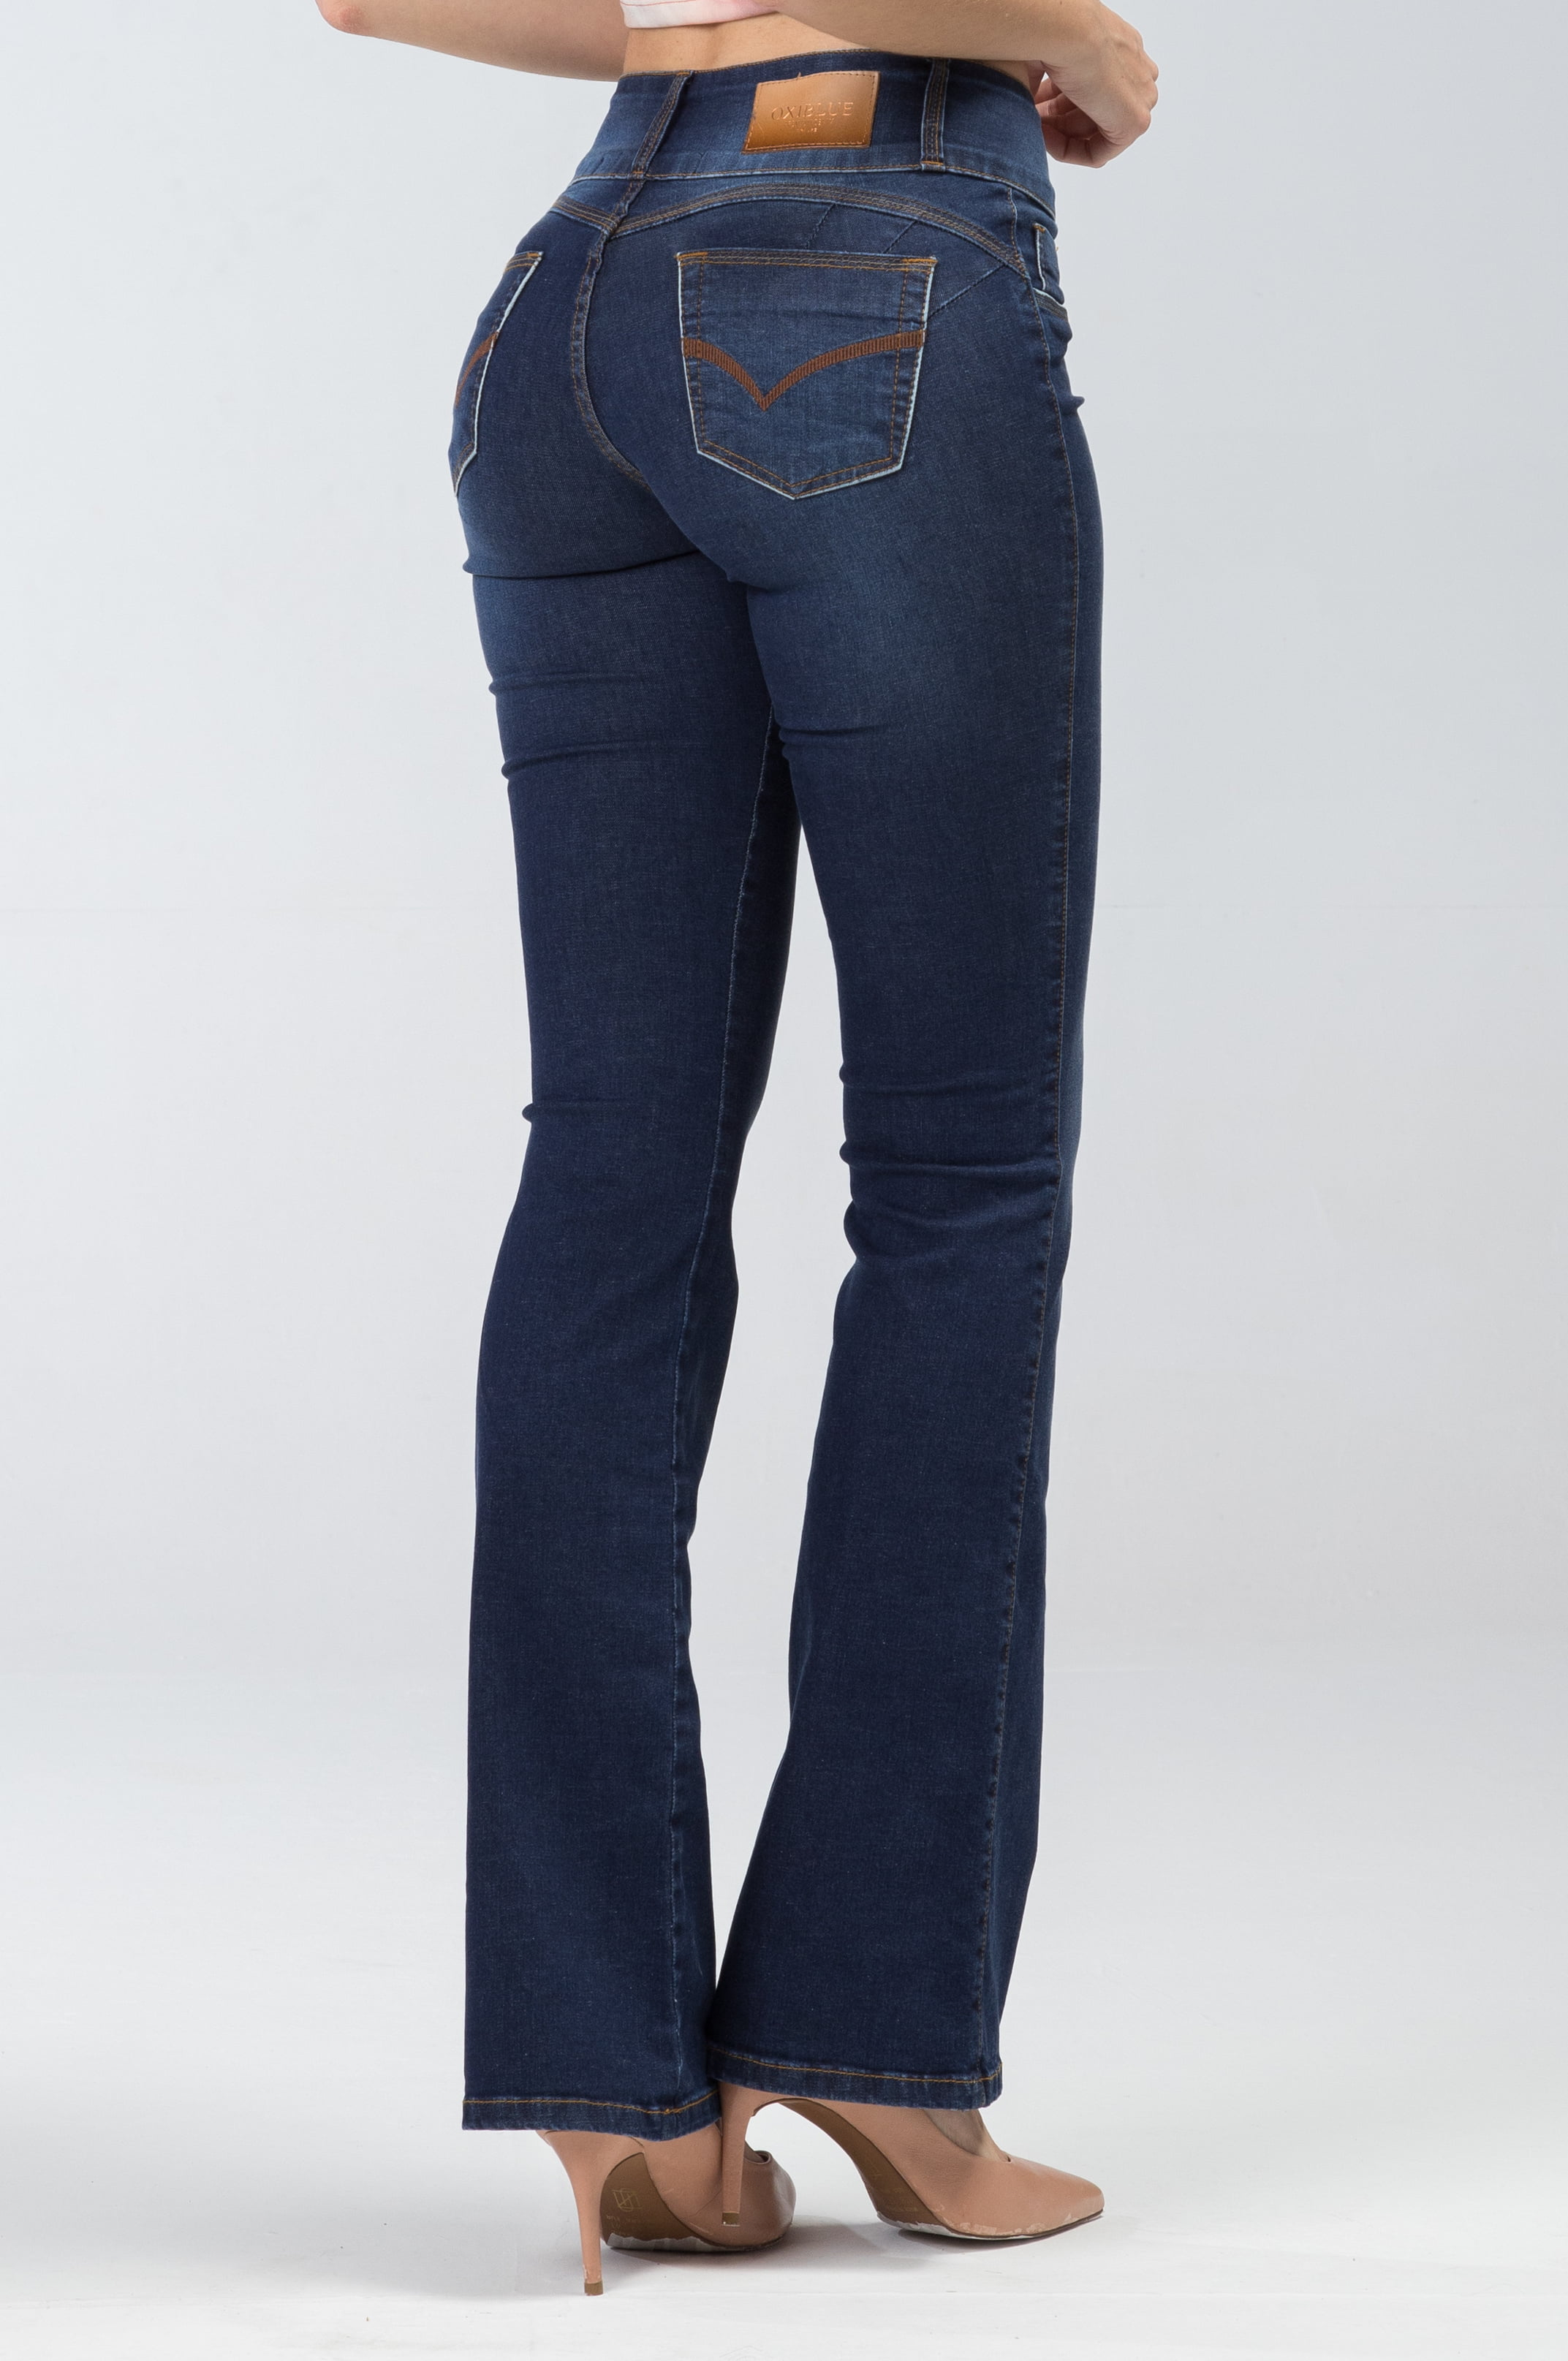 Calça Flare Jeans Levanta Bumbum F2020242